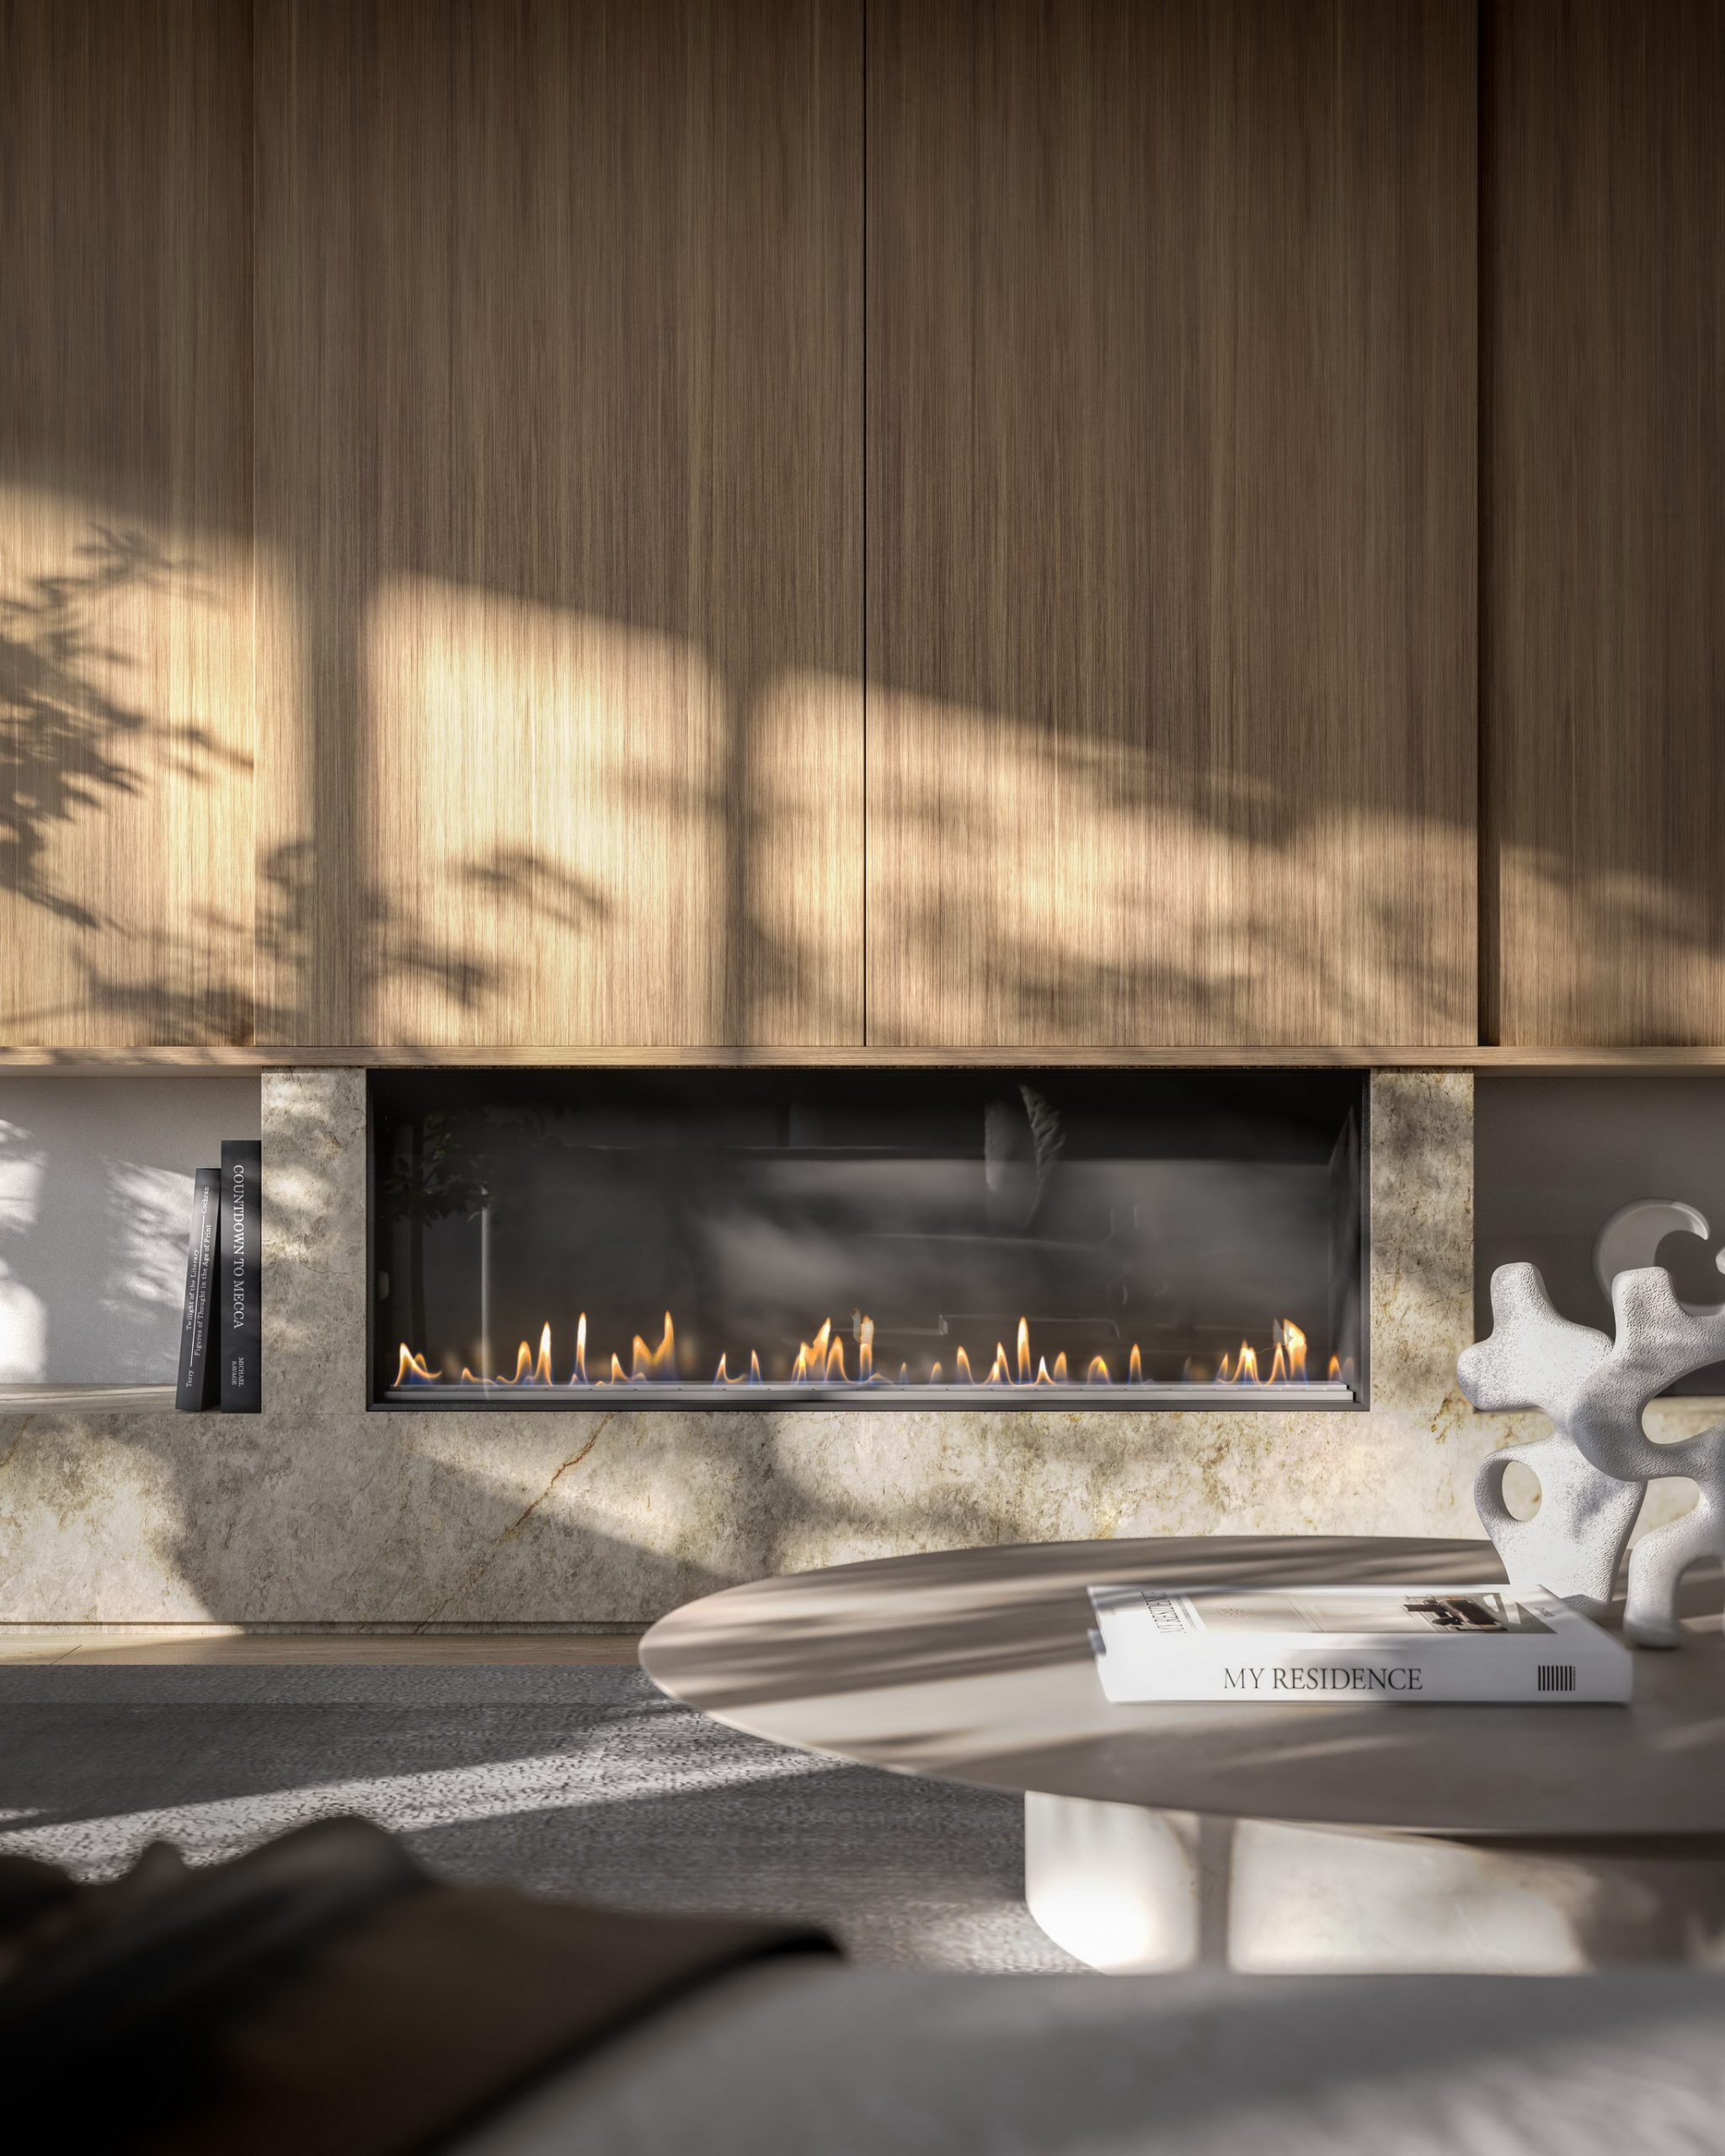 fkd-studio-3d-archiecture-visualisation-cgi-archviz-eaglemont-interior-fireplace-living